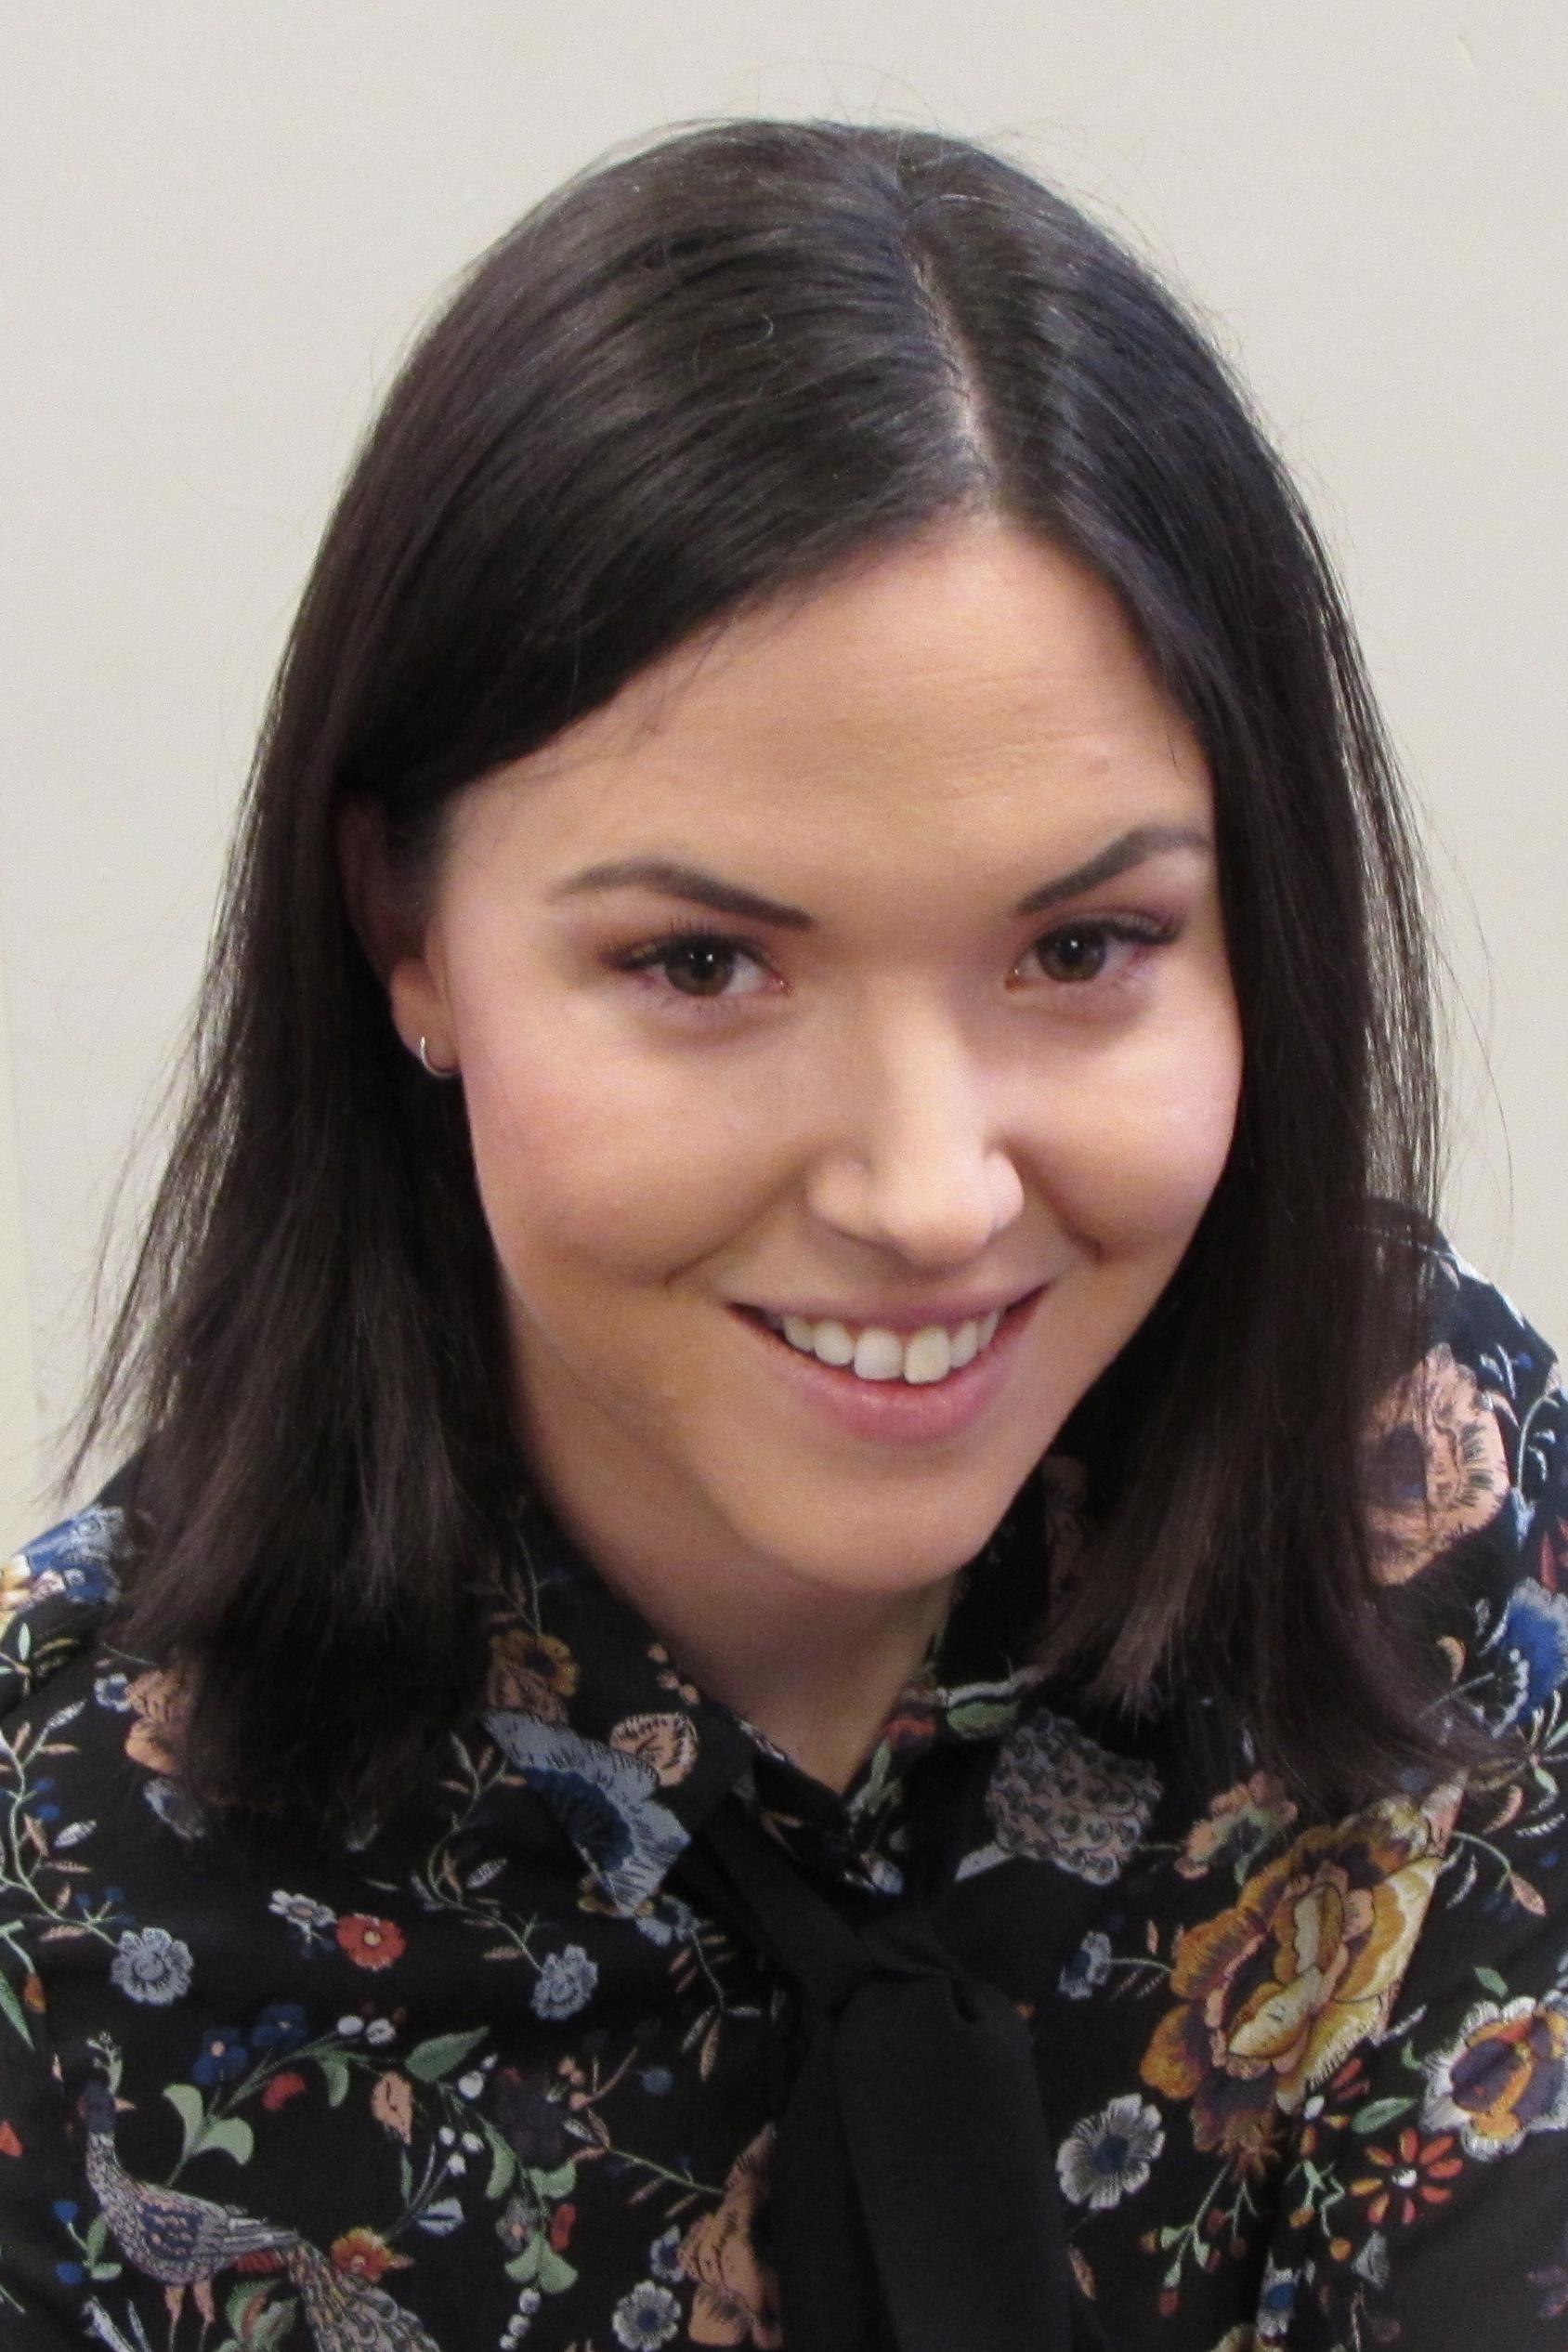 Camilla Abercrombie